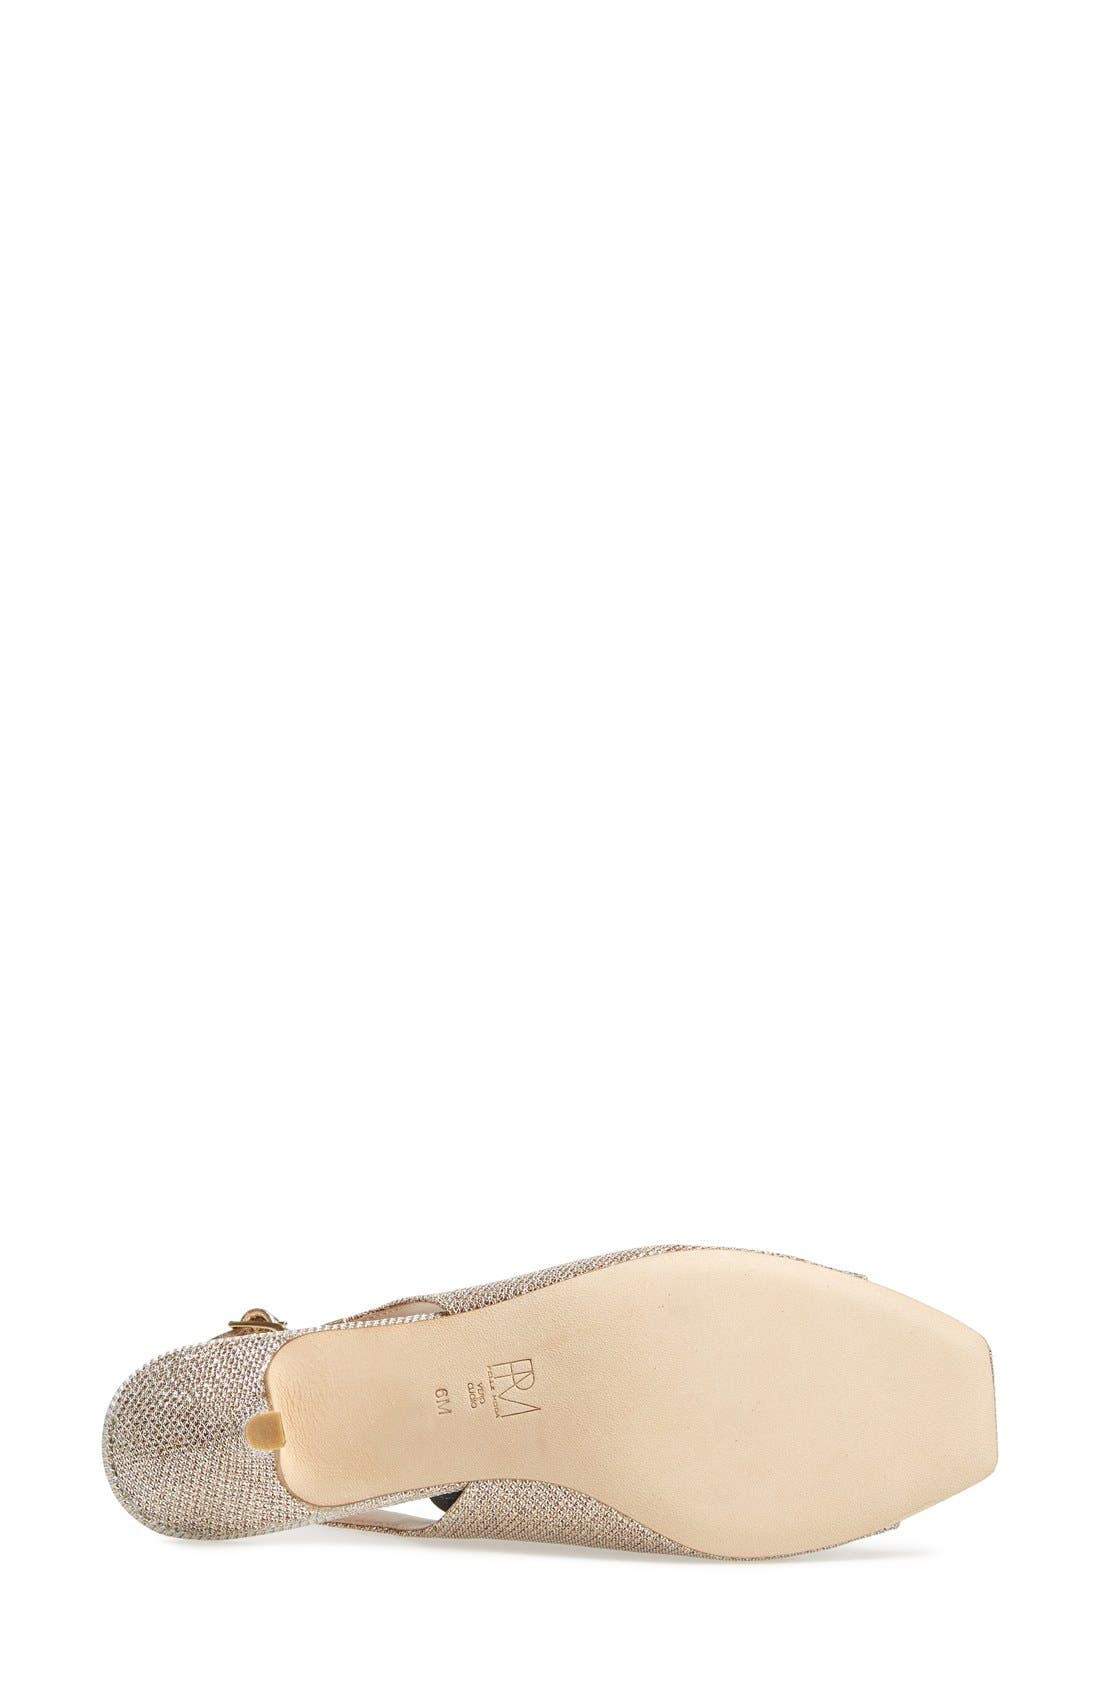 Alternate Image 4  - Pelle Moda 'Fresh' Jeweled Metallic Leather Slingback Sandal (Women)